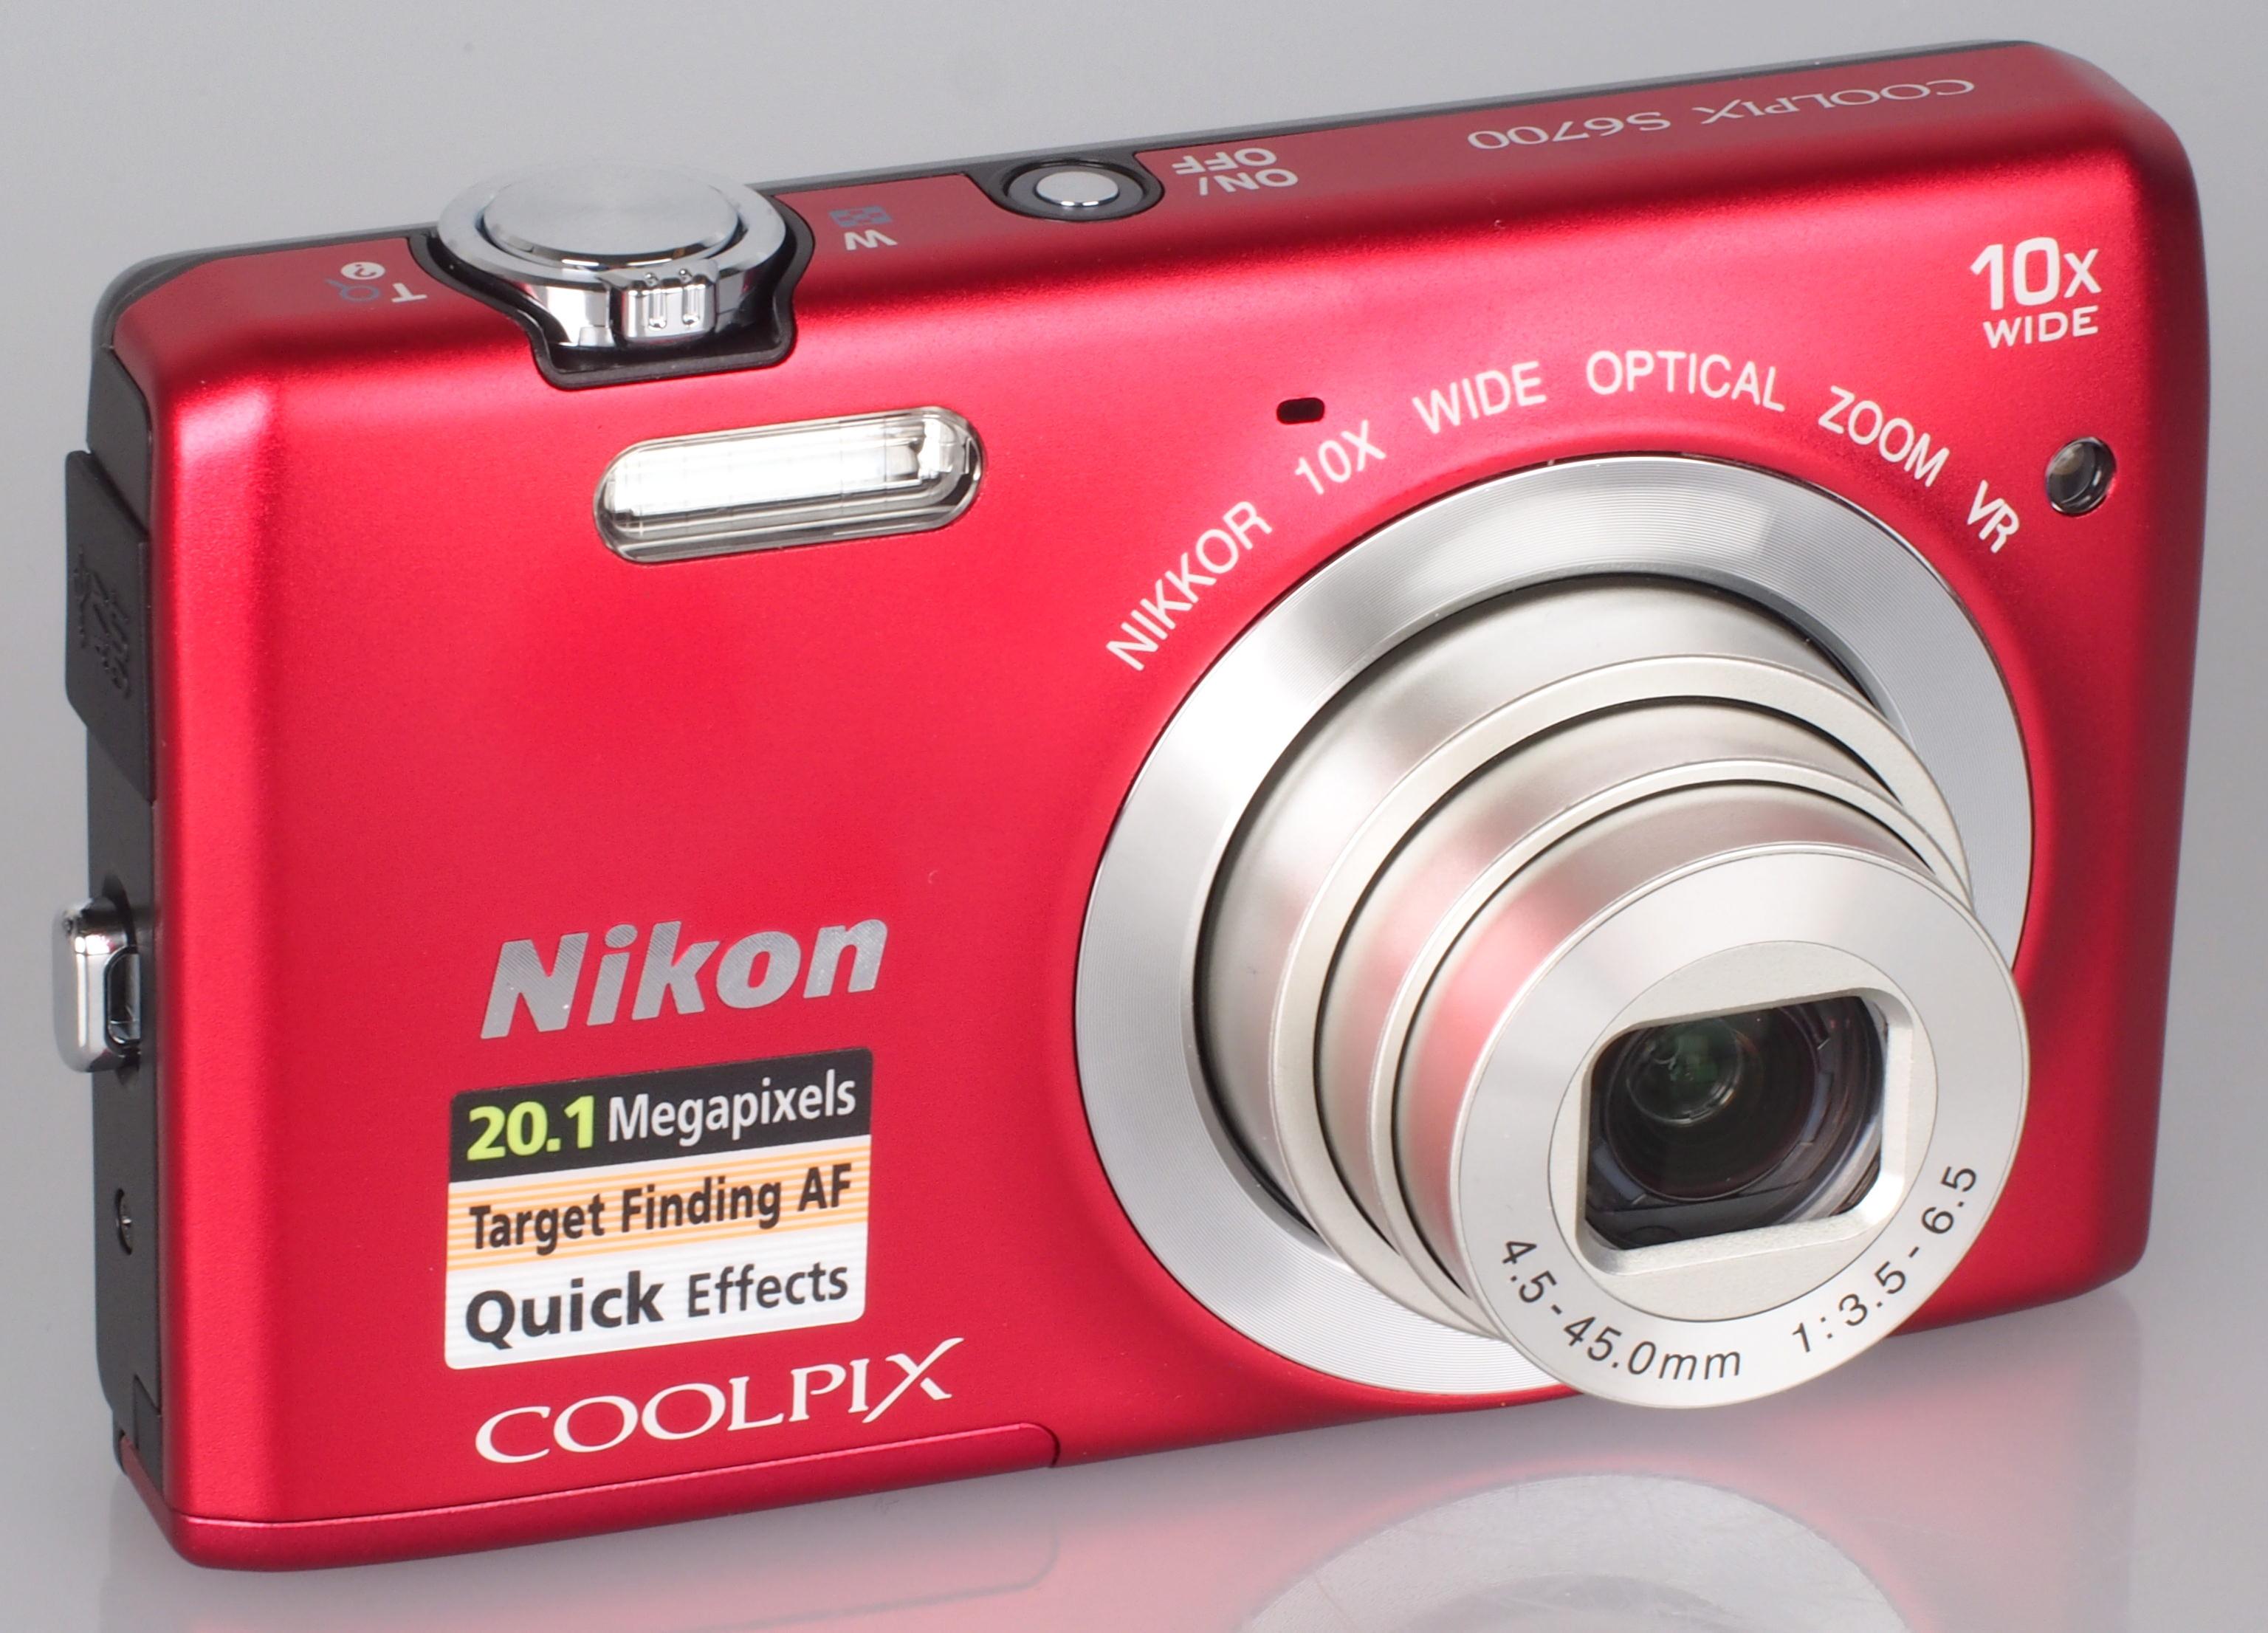 Nikon COOLPIX S6700 Camera Drivers Windows